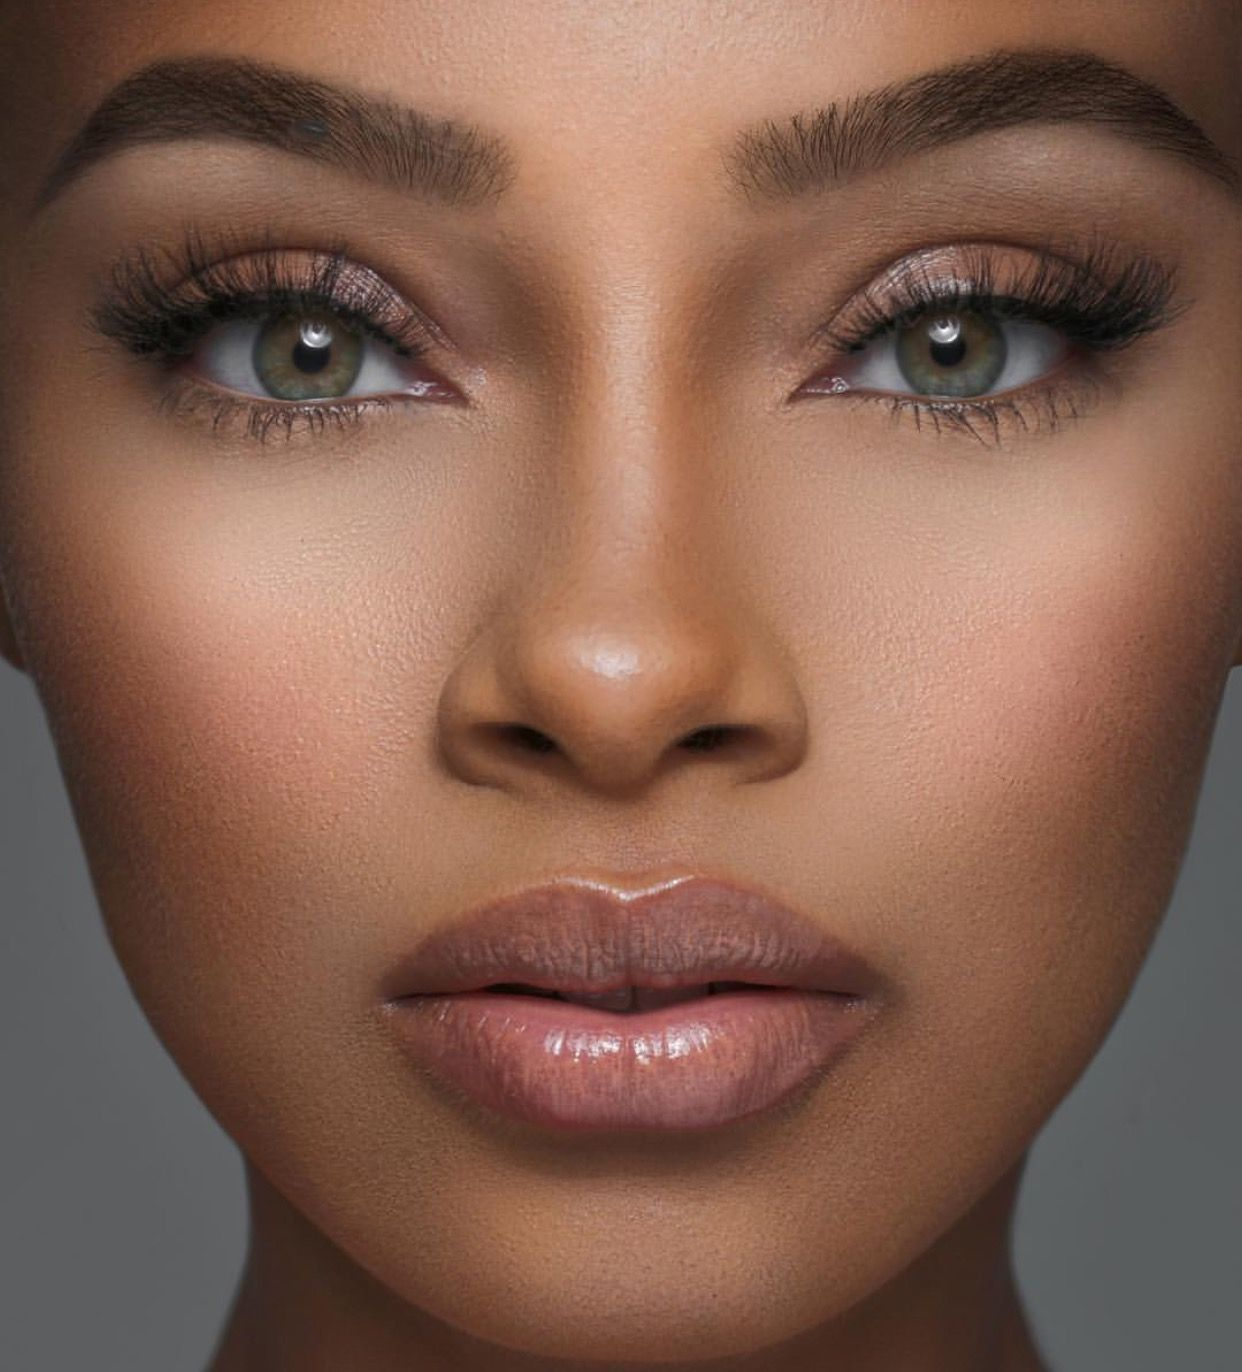 ᵛᴬᴿᵀᴬᴾ Makeup, Lip plumper, Nude lip